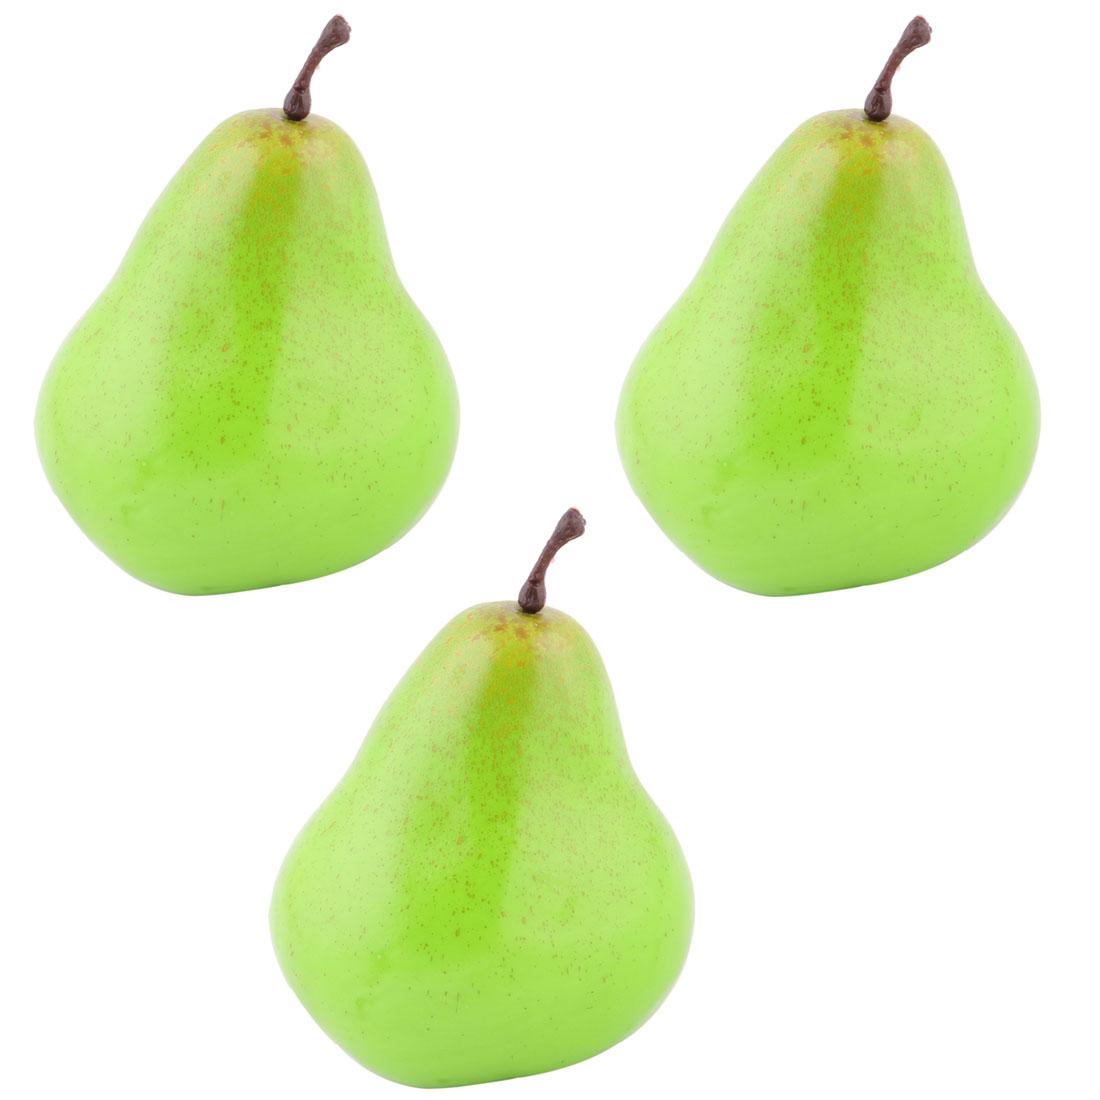 House Table Decor Foam Artificial Pear Designed Emulation Fruit Mold Green 3pcs